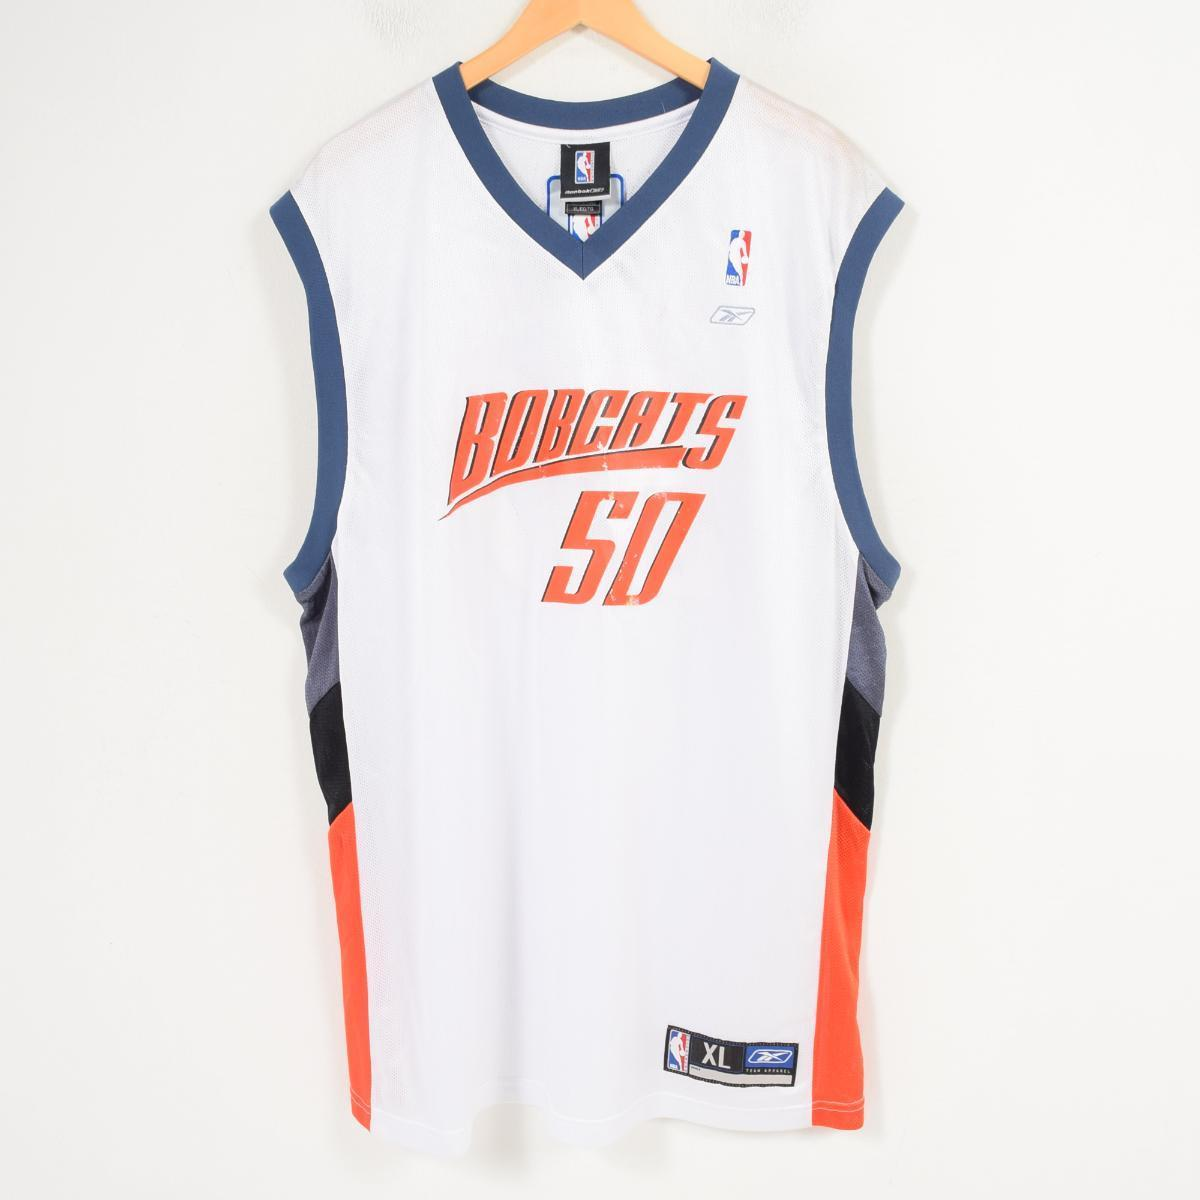 DEADSTOCK デッドストック リーボック Reebok NBA CHARLOTTE BOBCSTS シャーロットボブキャッツ ゲームシャツ レプリカユニフォーム メンズXL /wap0662 【中古】 【180403】